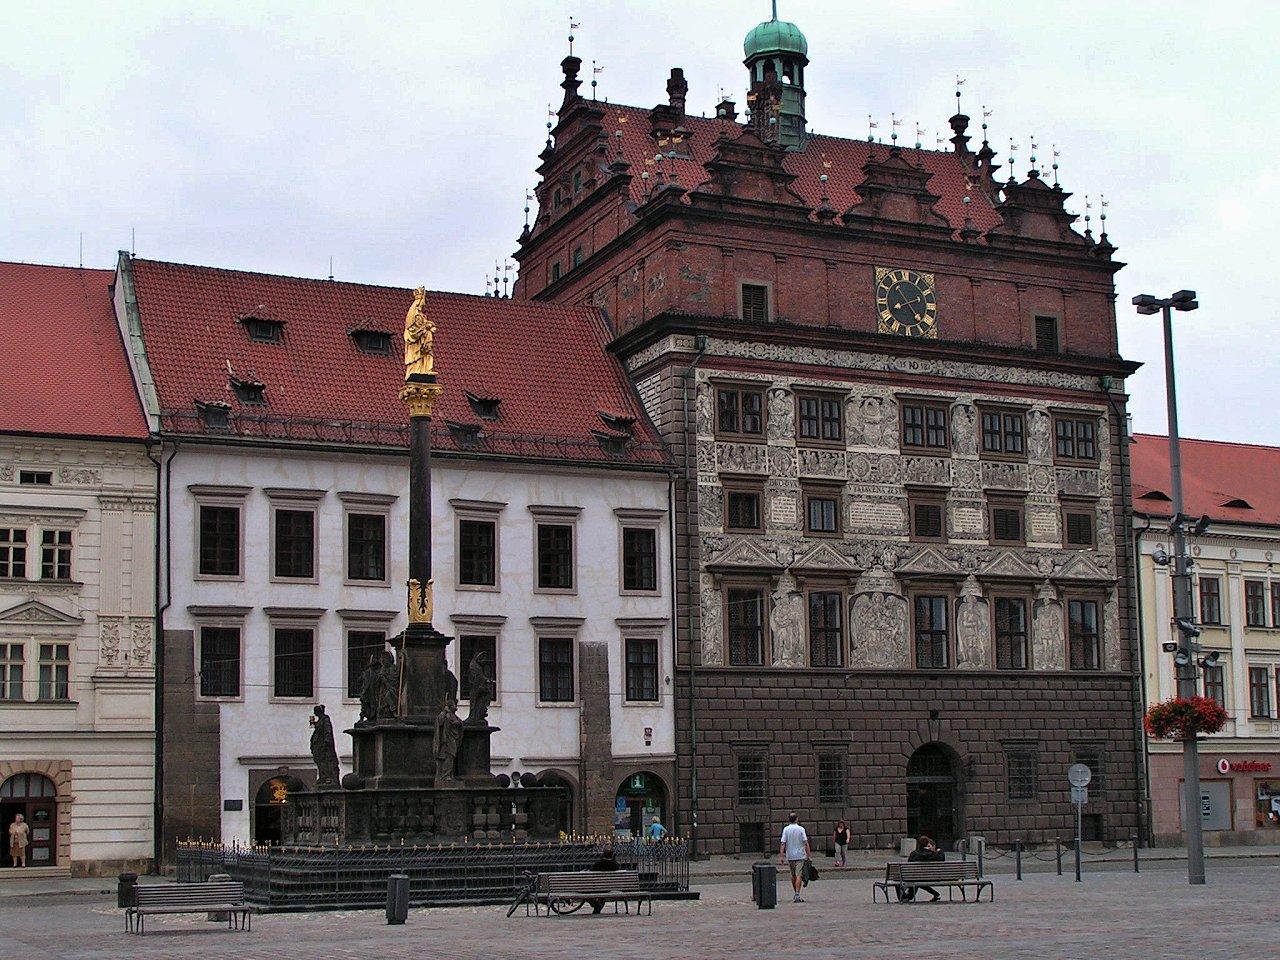 Pilsen, Places to Visit in the Czech Republic